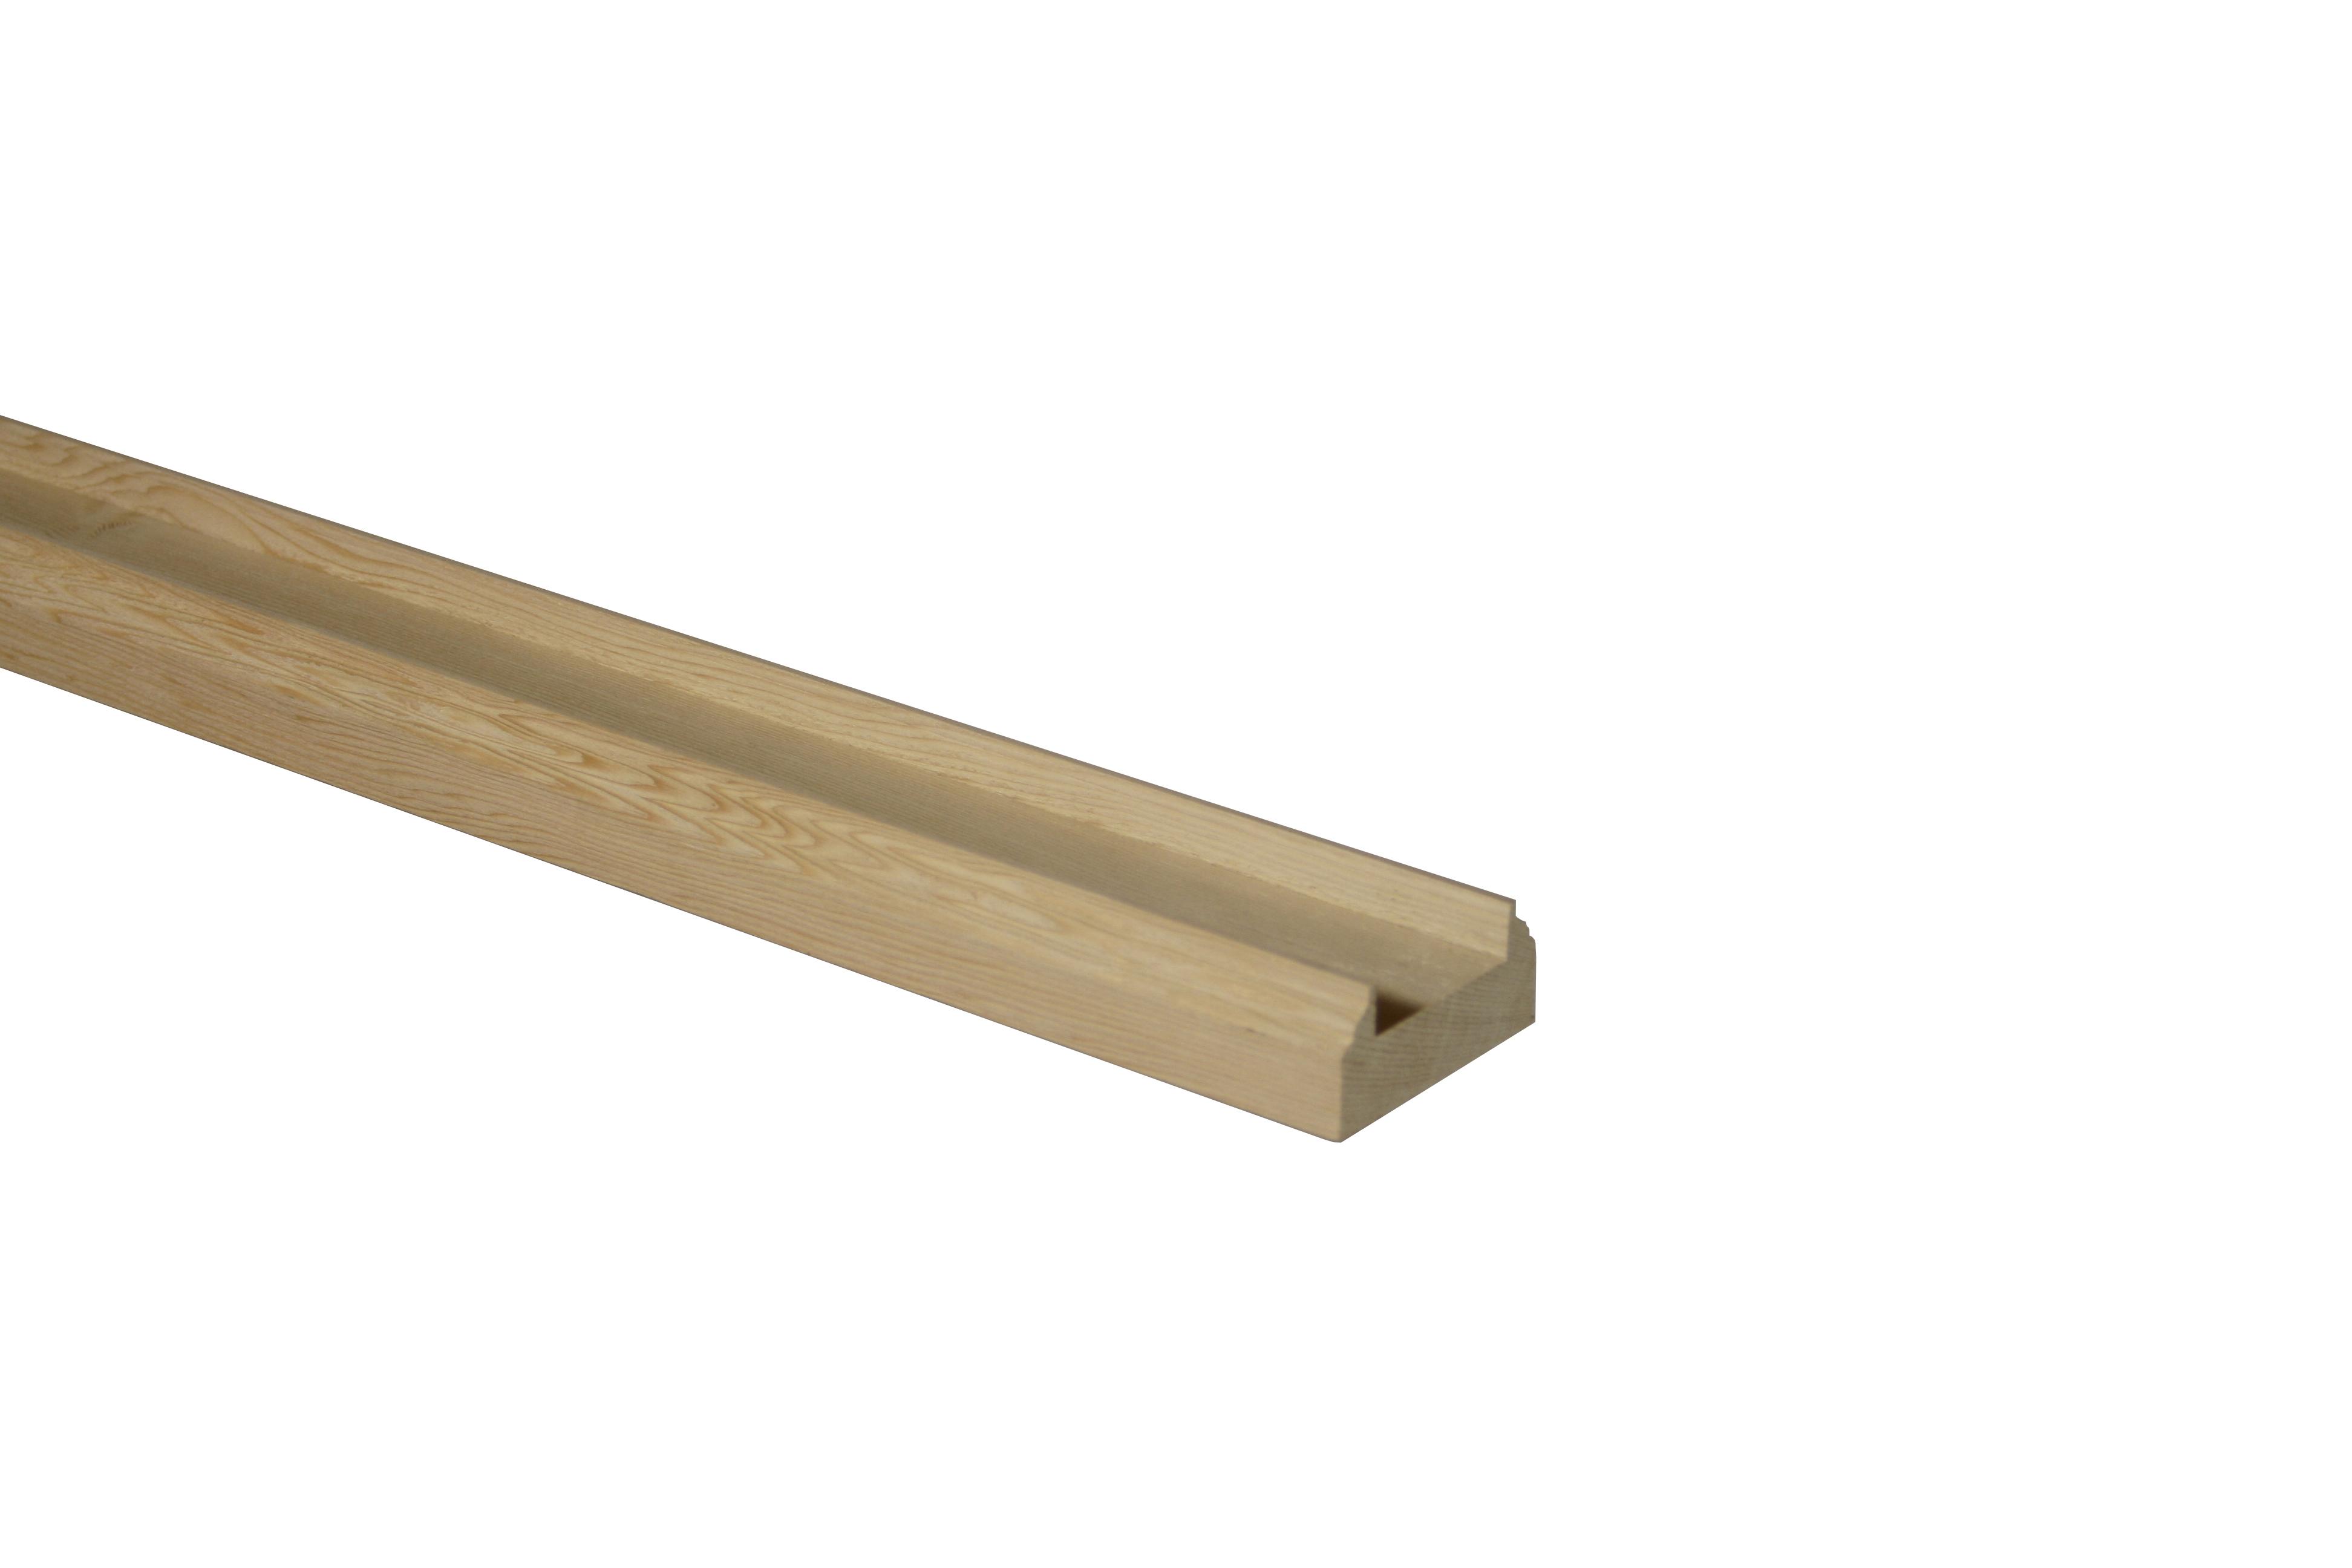 1 Oak Baserail 2400 32